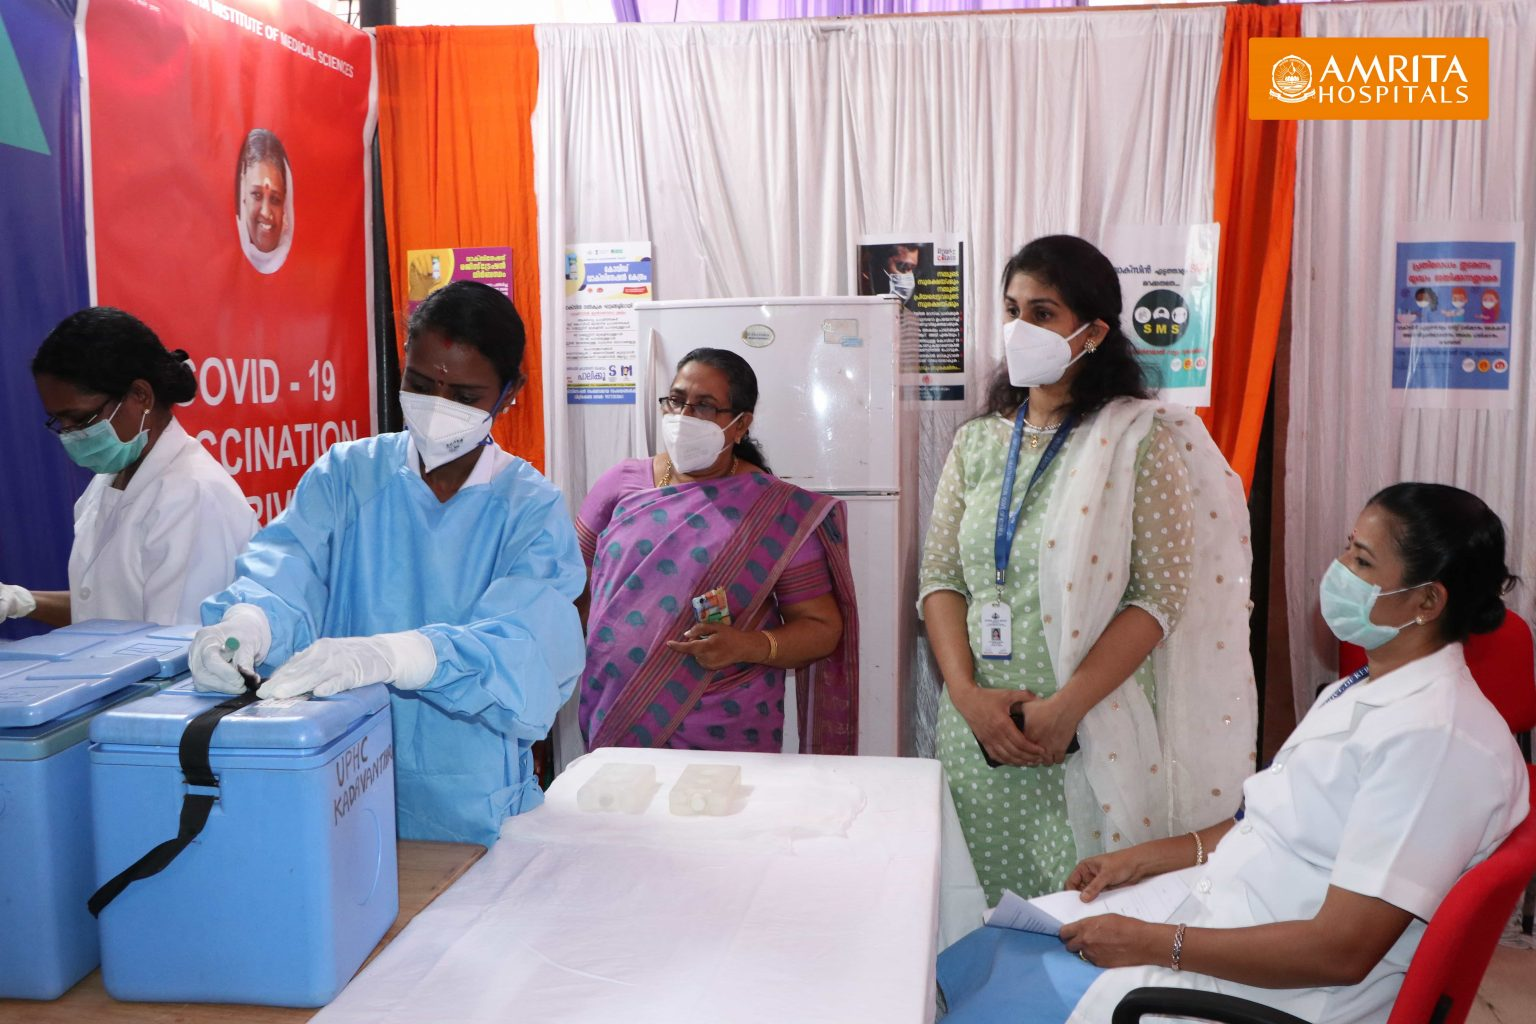 2021-01-15-COVID-Vaccination-PPP-Amrita-Hospital-Kochi-4-1536x1024